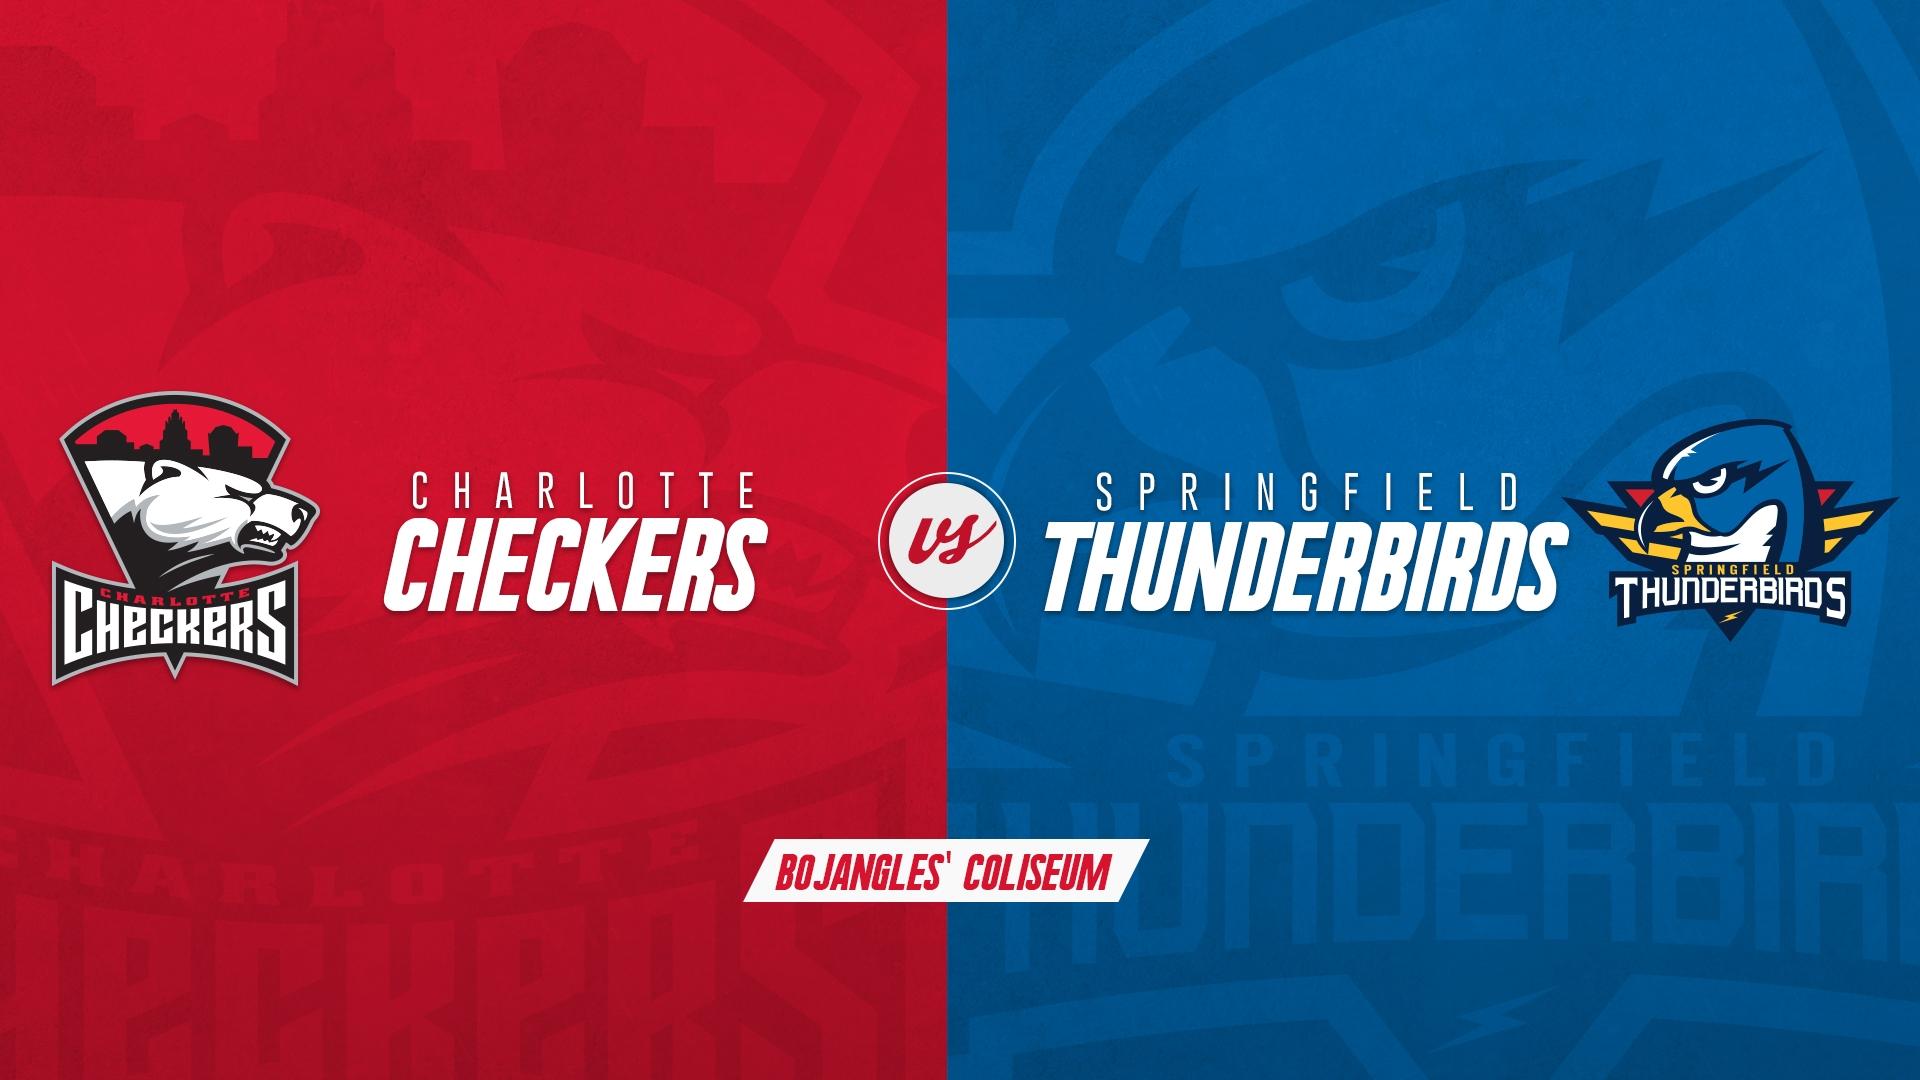 Charlotte Checkers vs. Springfield Thunderbirds